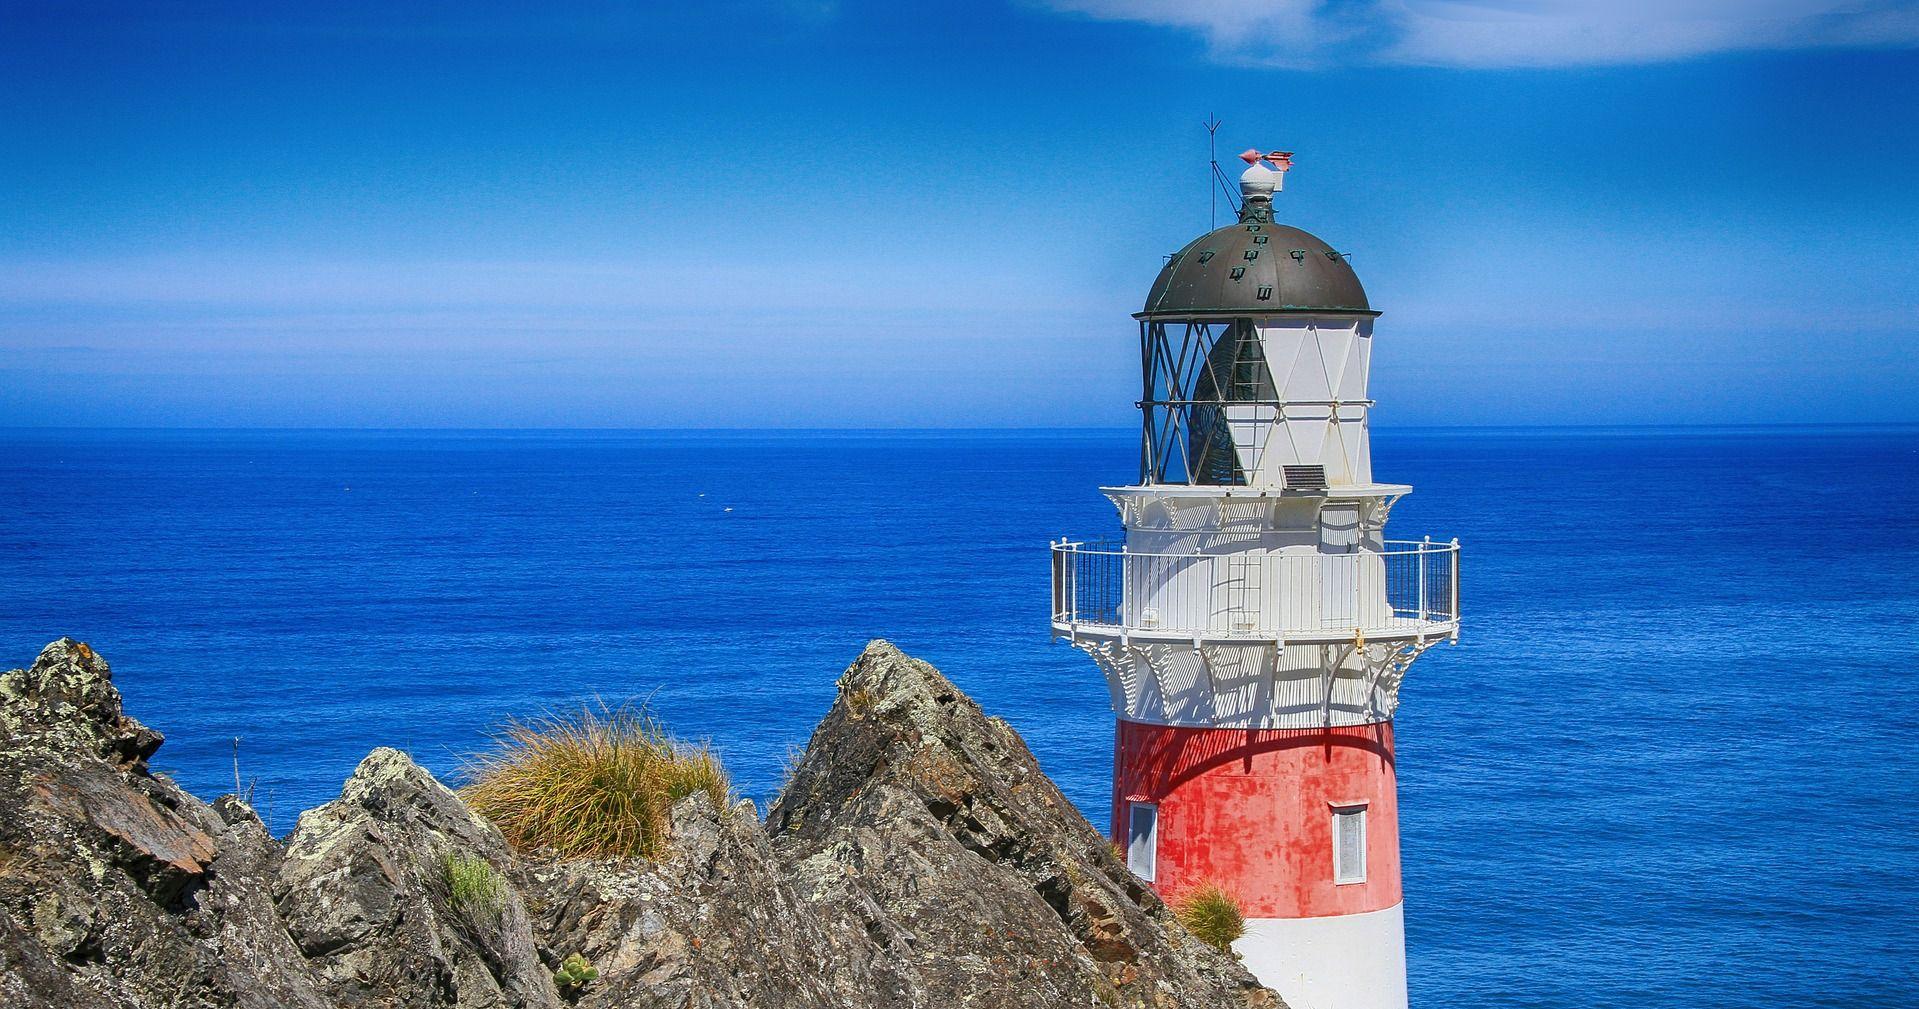 South Island Special New Zealand - Premium